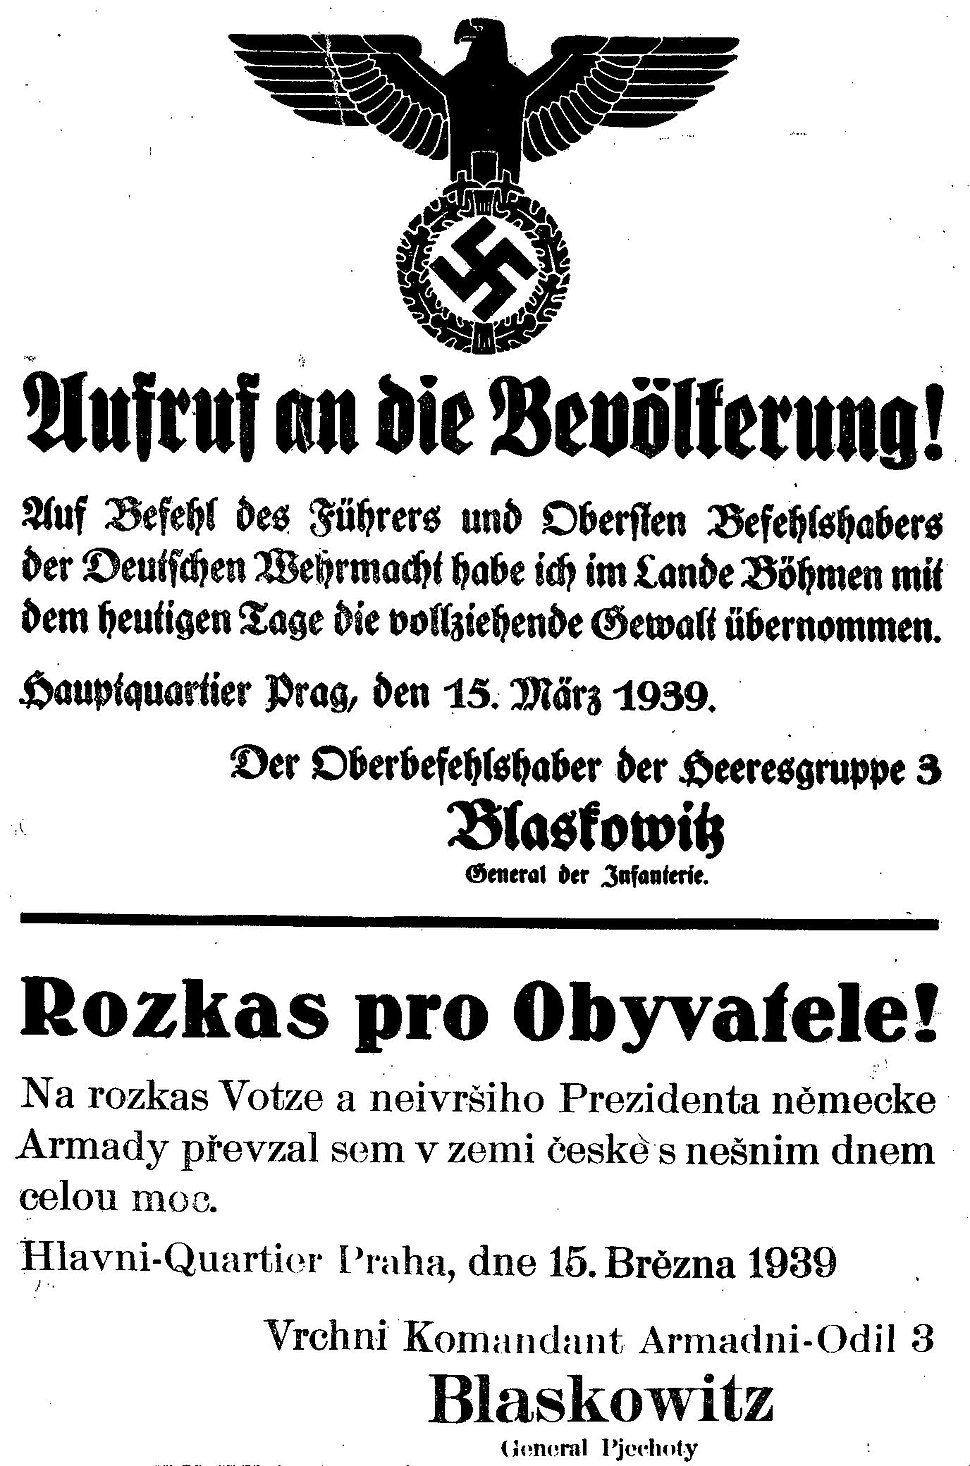 Poster Protektor%C3%A1t - Rozkas pro obyvatele 1939 (01).jpg